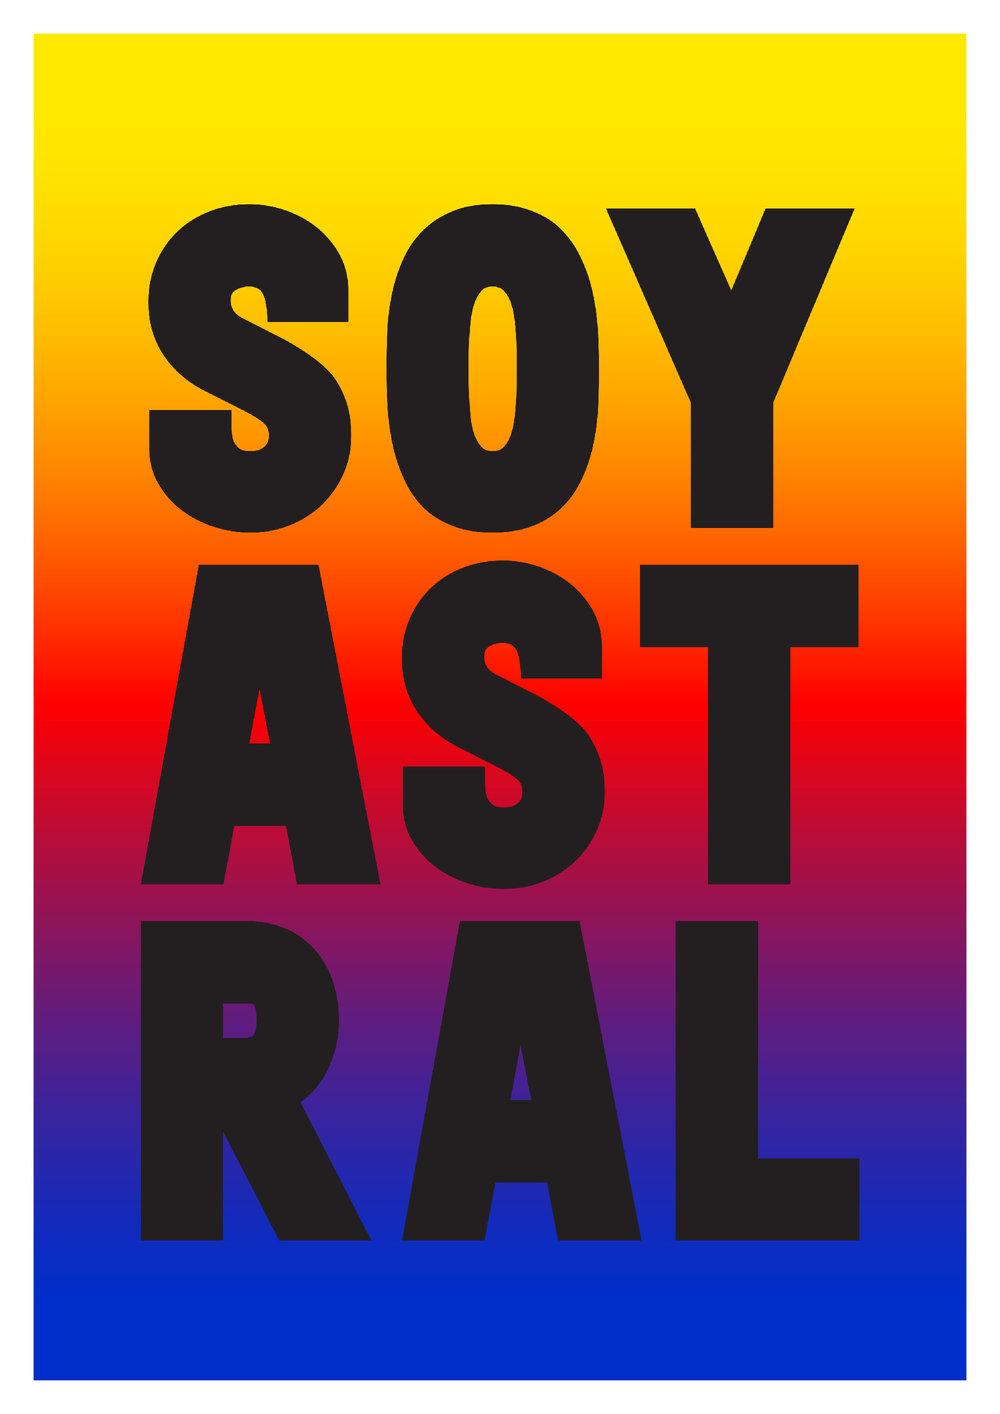 cartazes-ASTRAL-SEMPRE-final-1.jpg